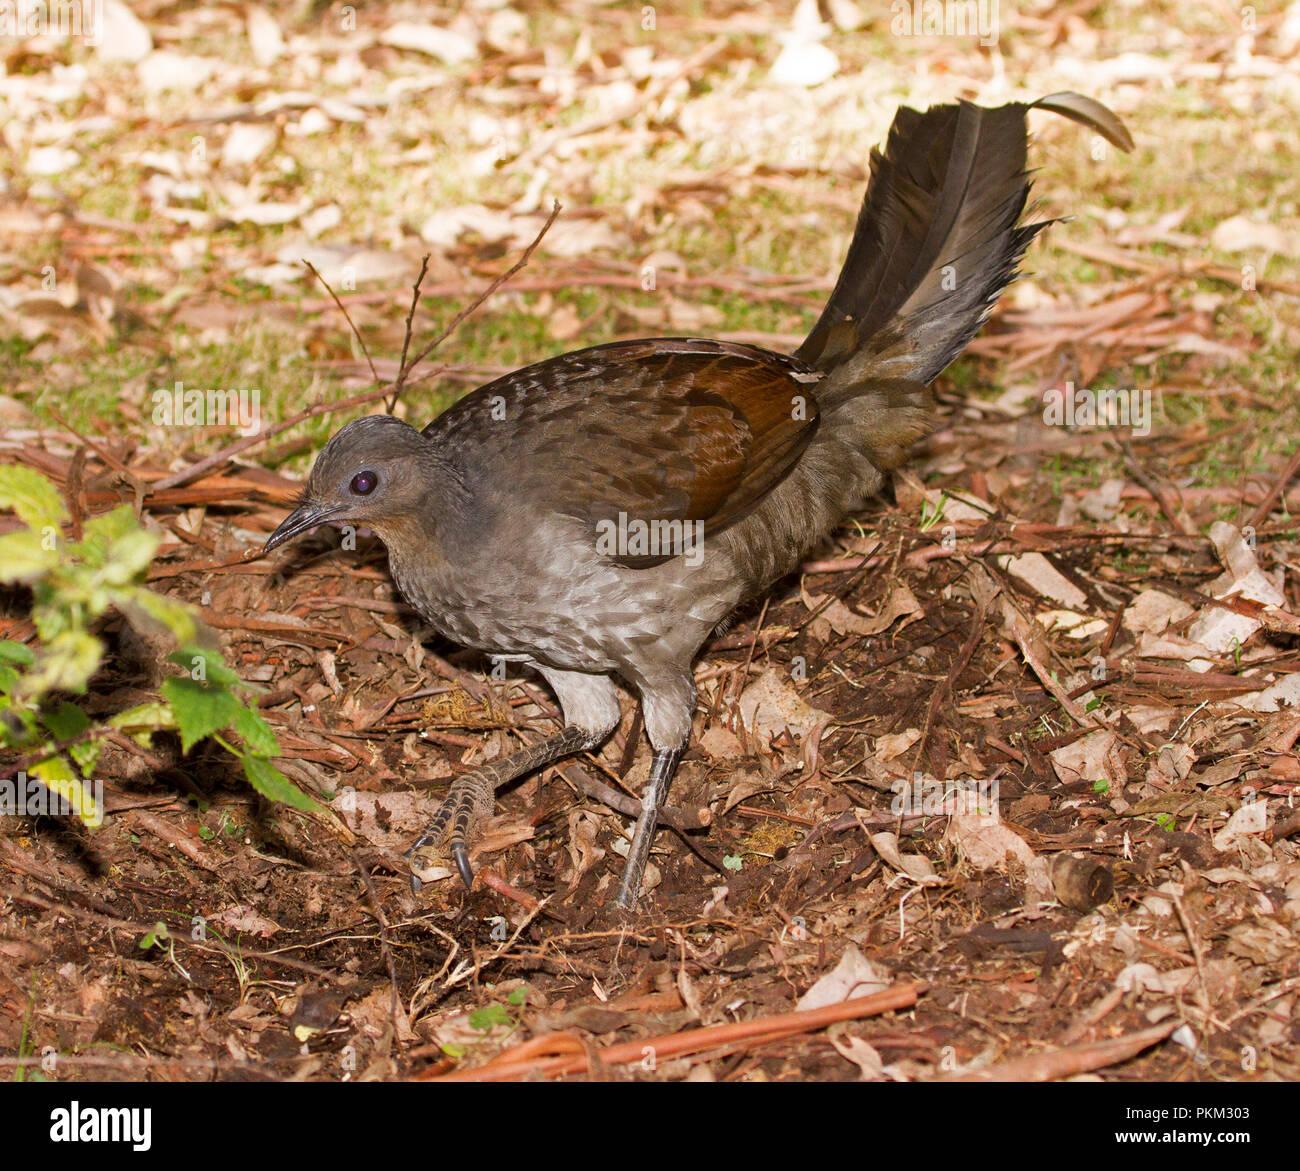 female australian superb lyrebird menura novaehollandiae